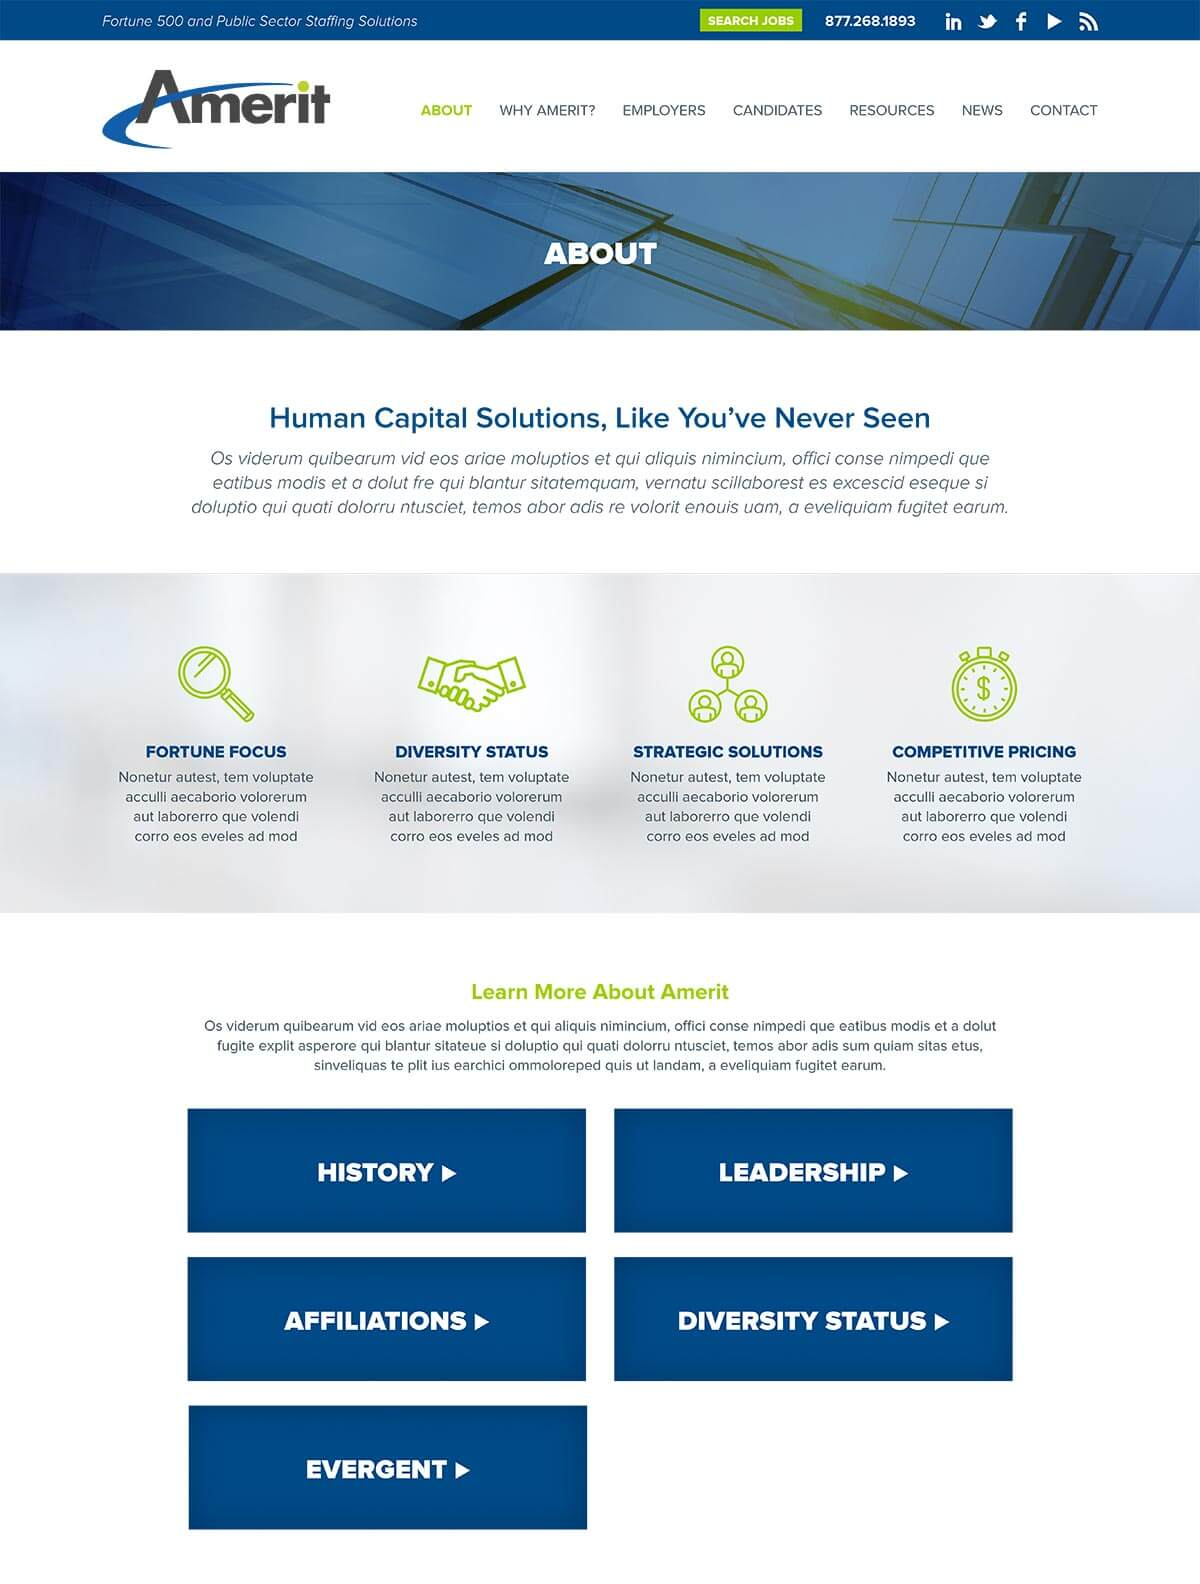 Amerit website about page v2